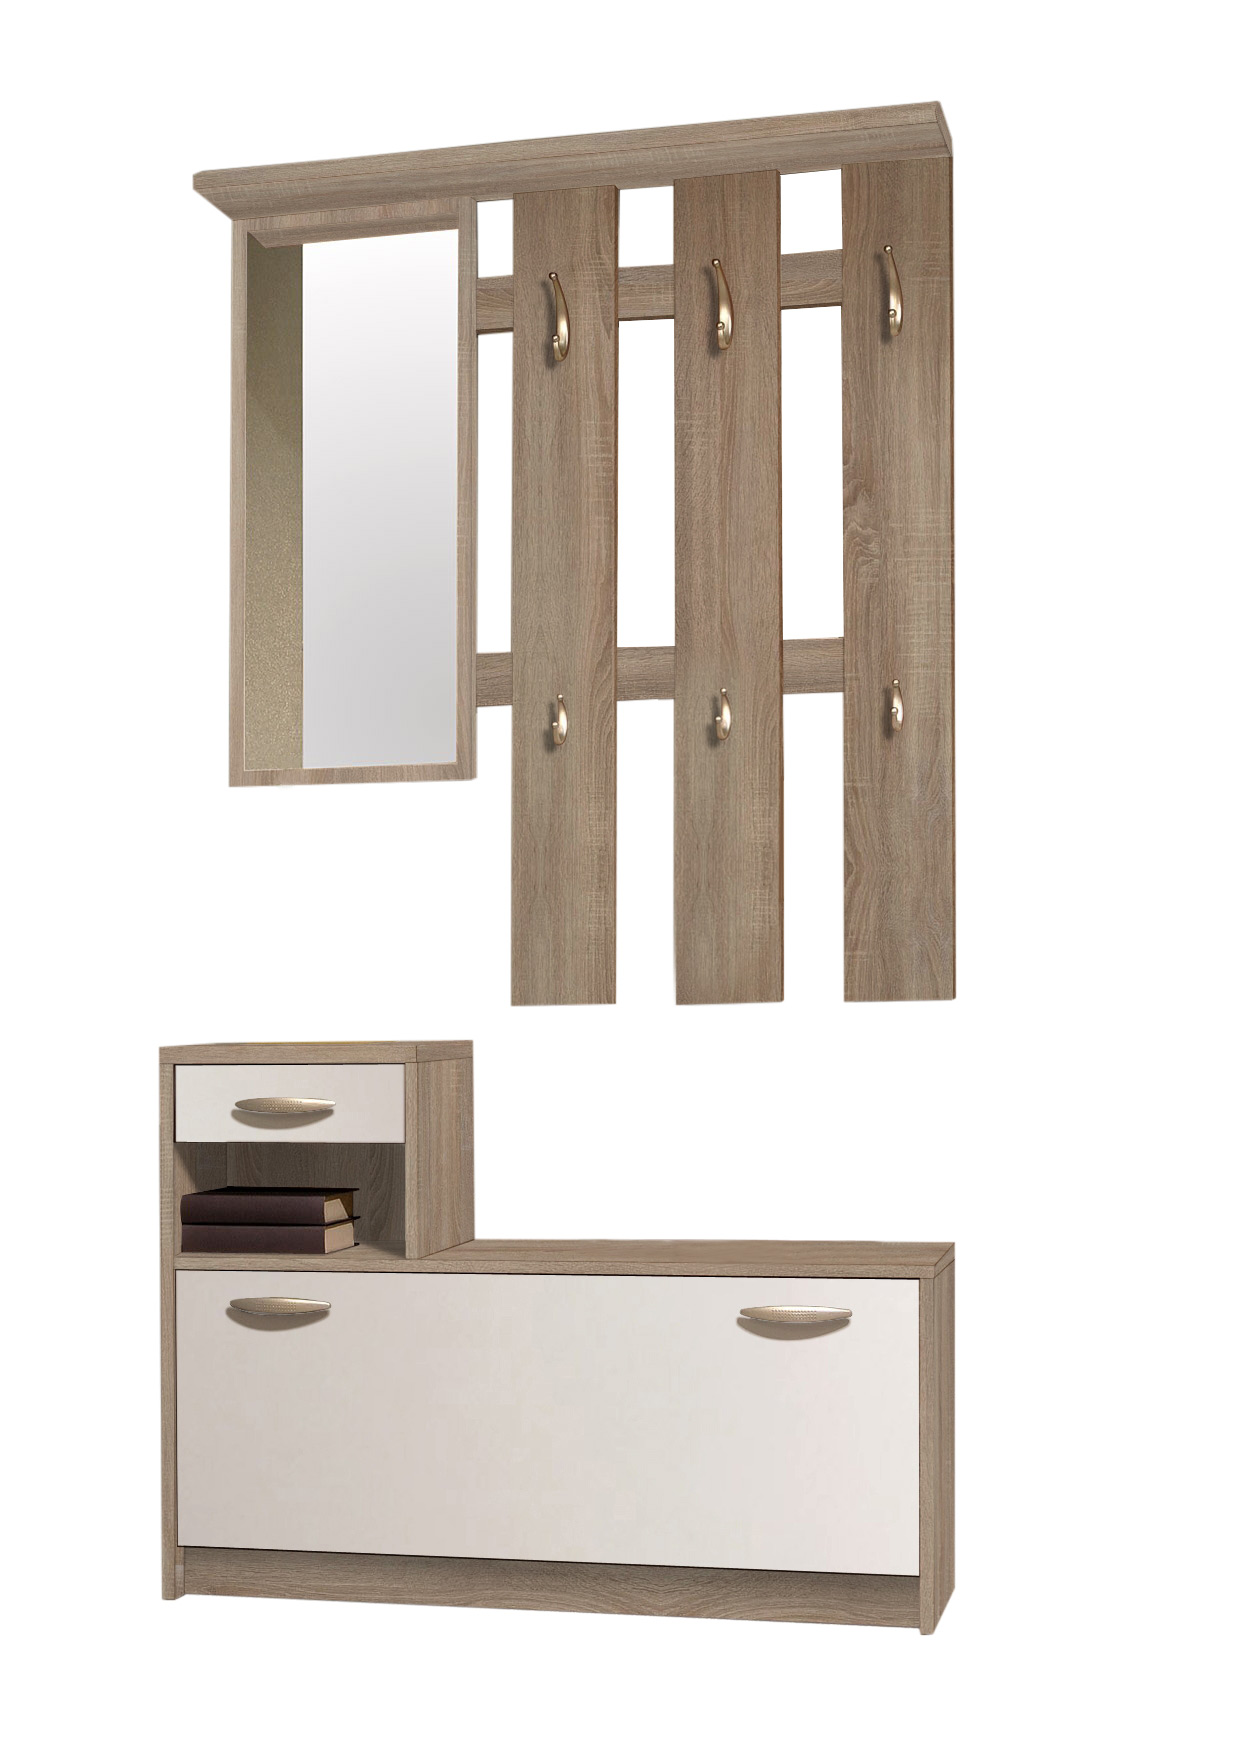 garderobe vera flurgarderobe paneel wandgarderobe set spiegel wei sonoma ebay. Black Bedroom Furniture Sets. Home Design Ideas